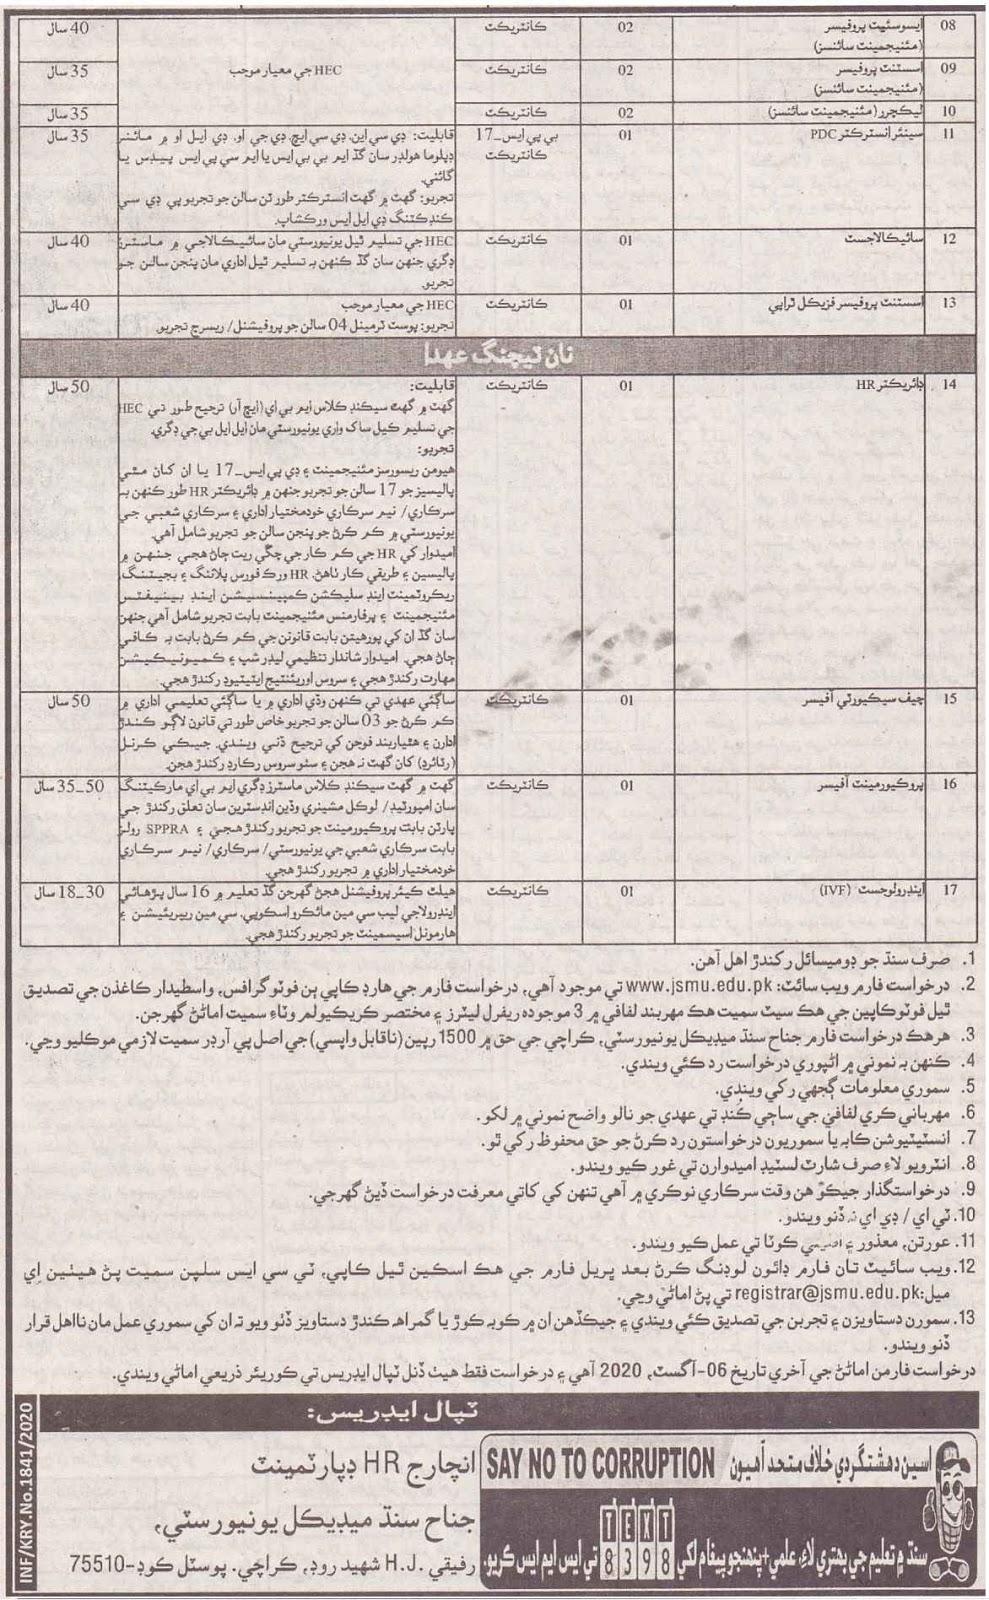 Jinnah Sindh Medical University JSMU Karachi Jobs 2020